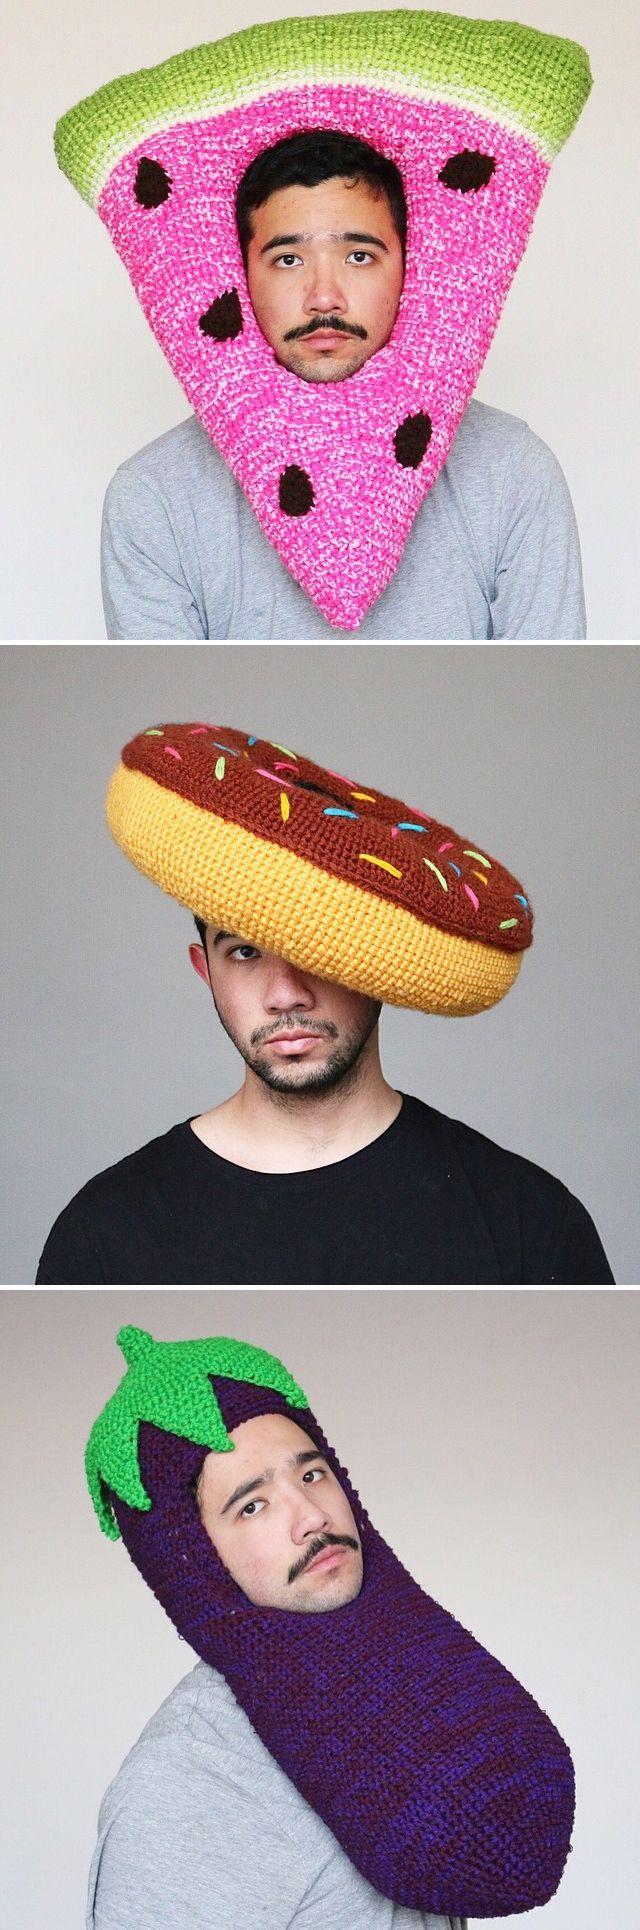 Crochet hats // DIY // crocheted food // costumes // food costumes